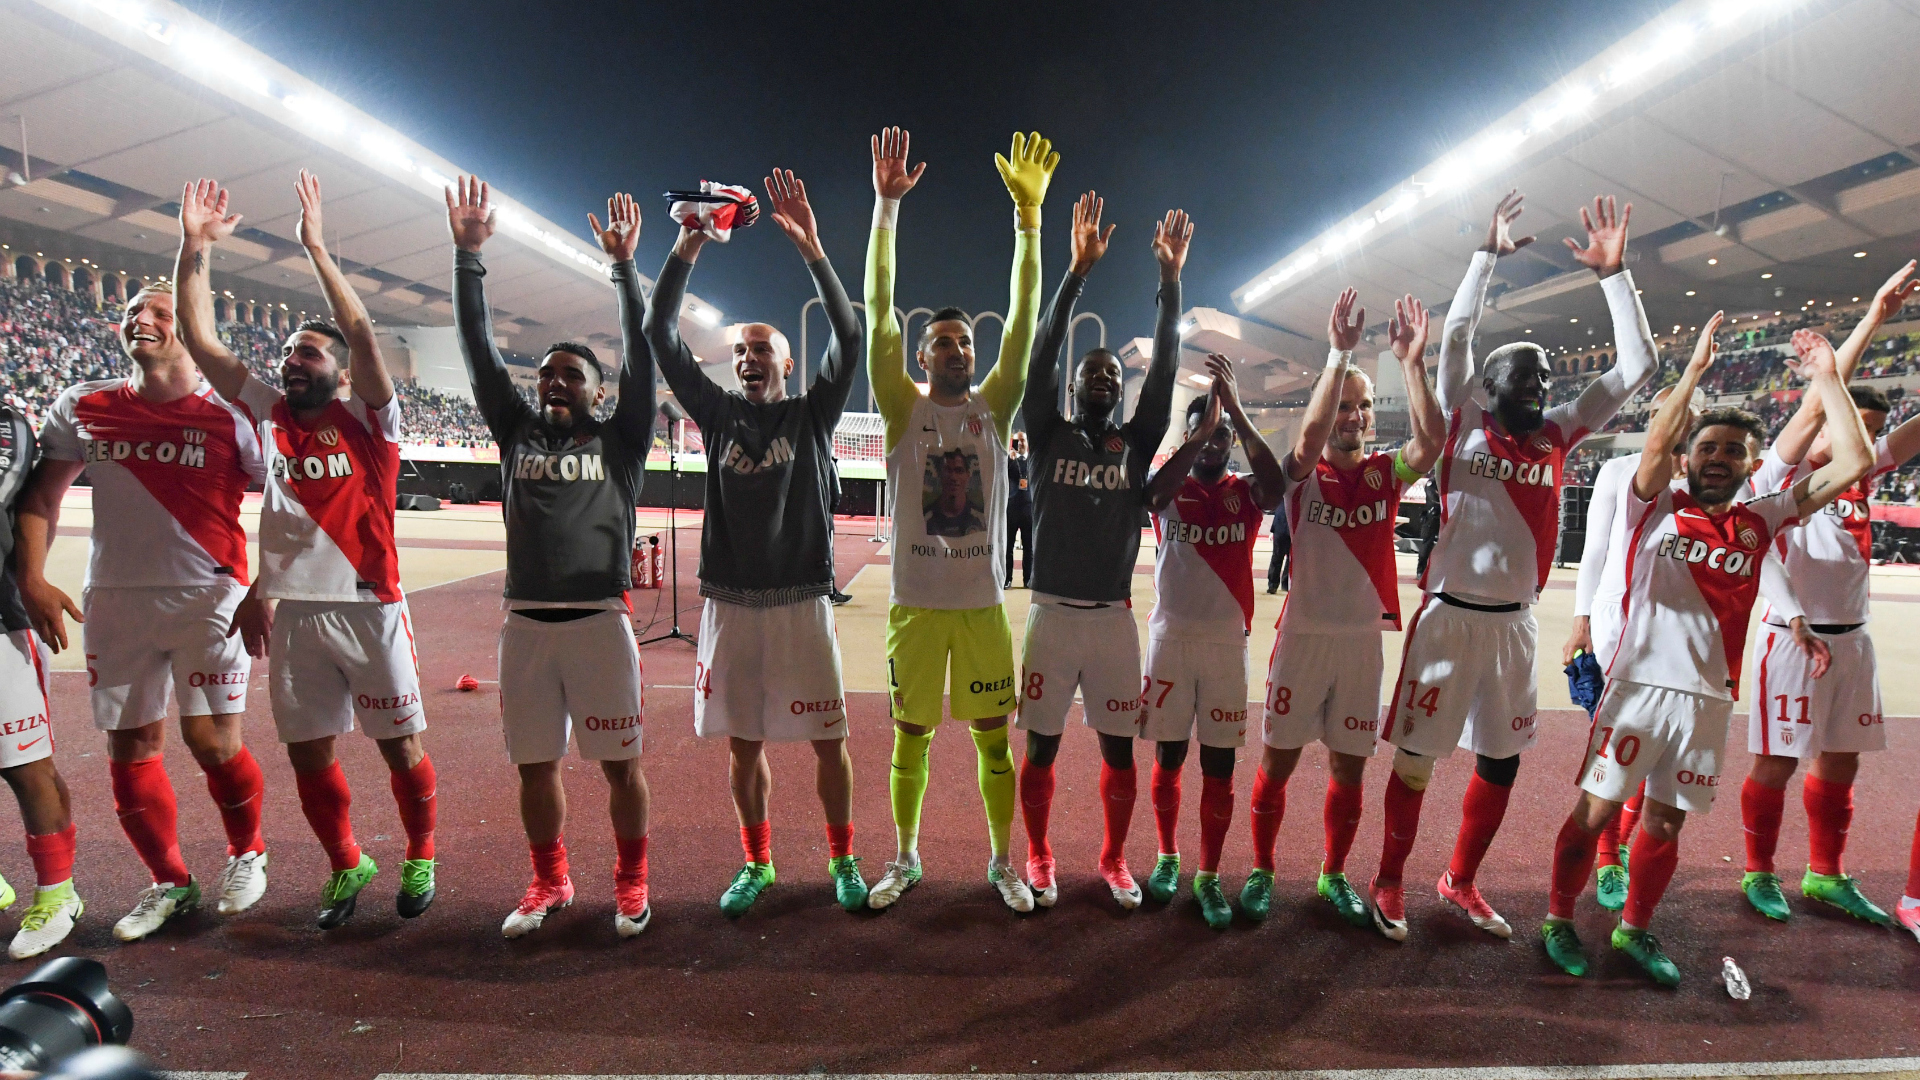 Ligue 1, Monaco-Saint-Etienne 2-0: arriva il titolo